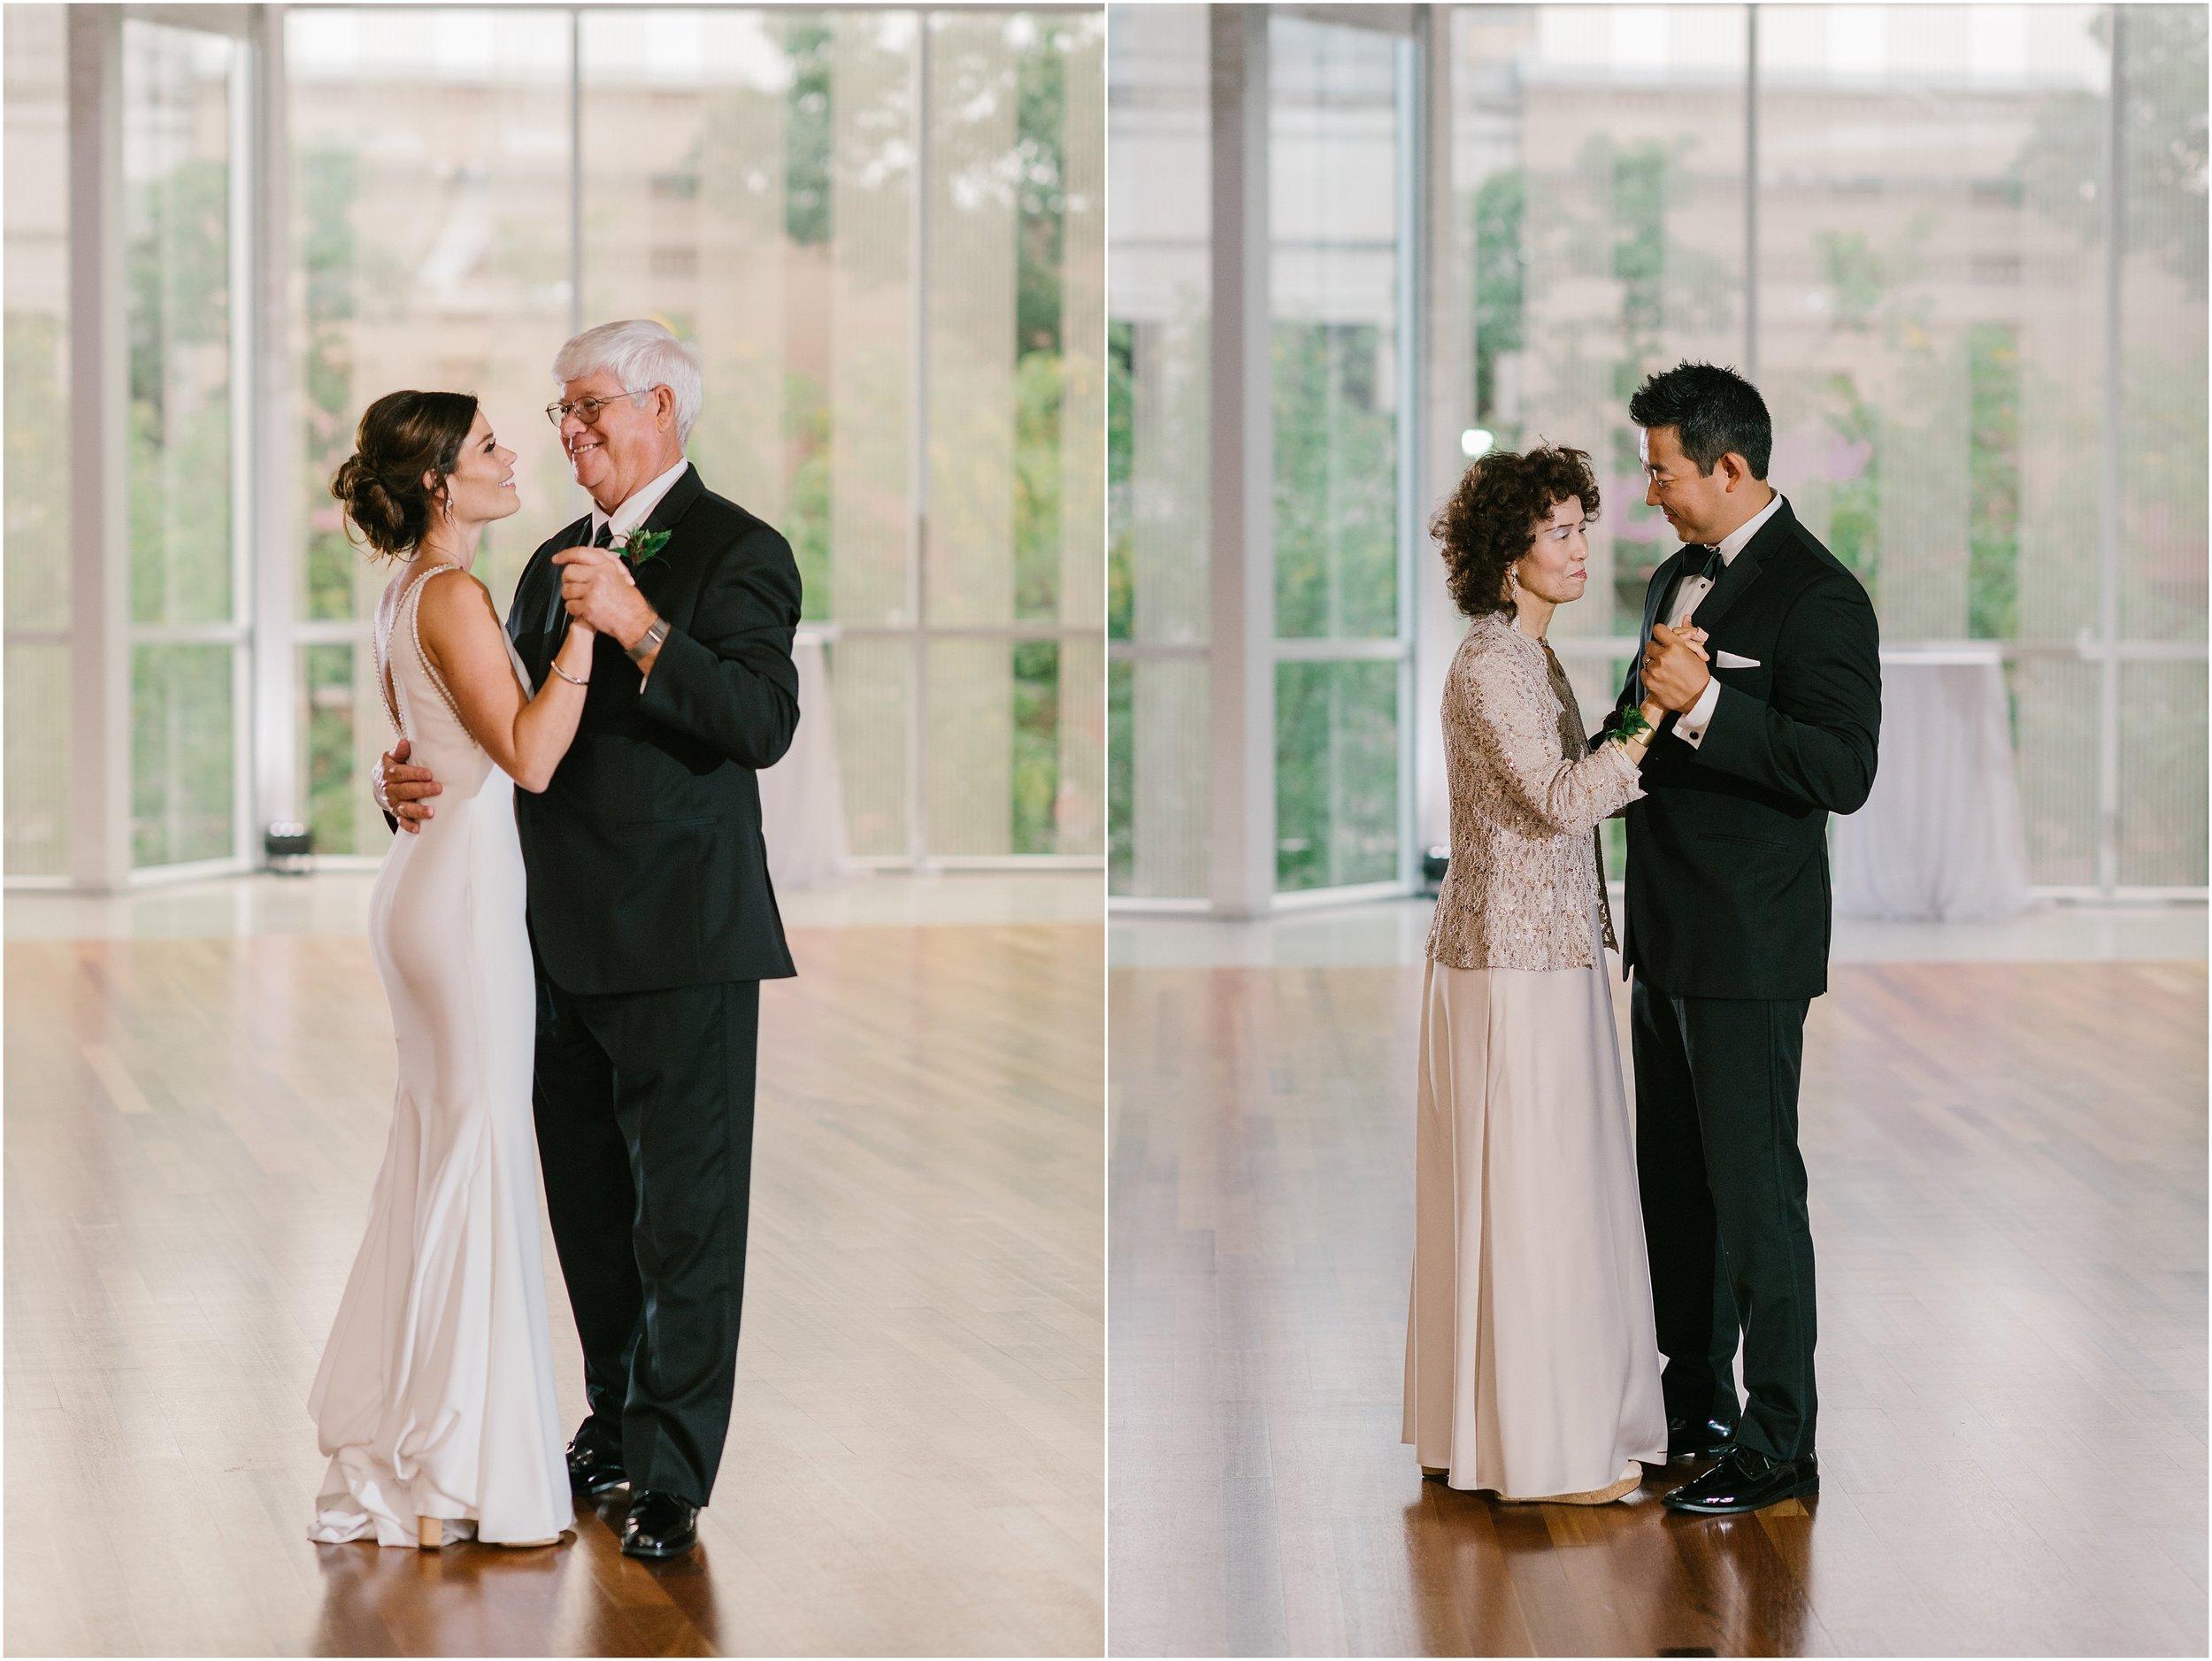 Rebecca_Shehorn_Photography_Indianapolis Wedding Photographer Sycamore at Mallow Run Wedding_9766.jpg